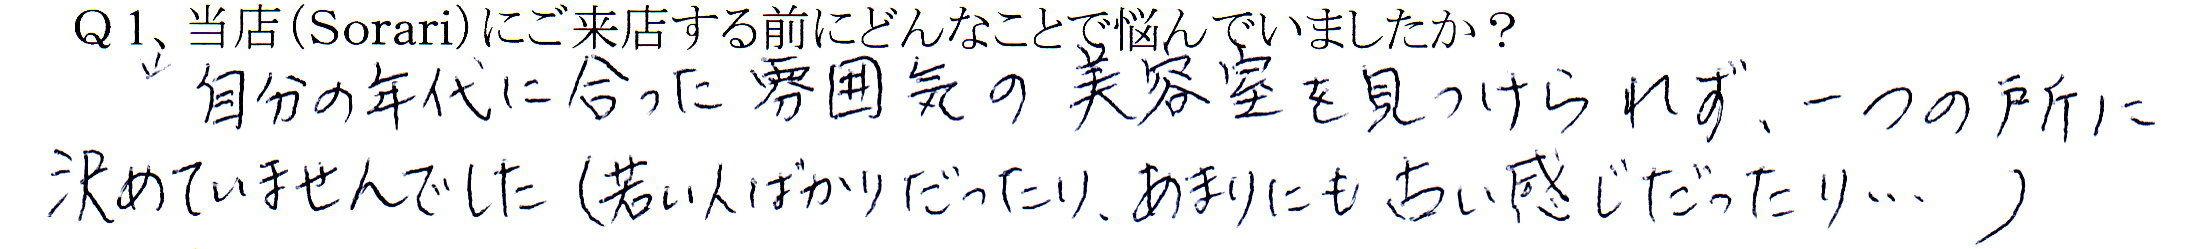 15KI様Q1